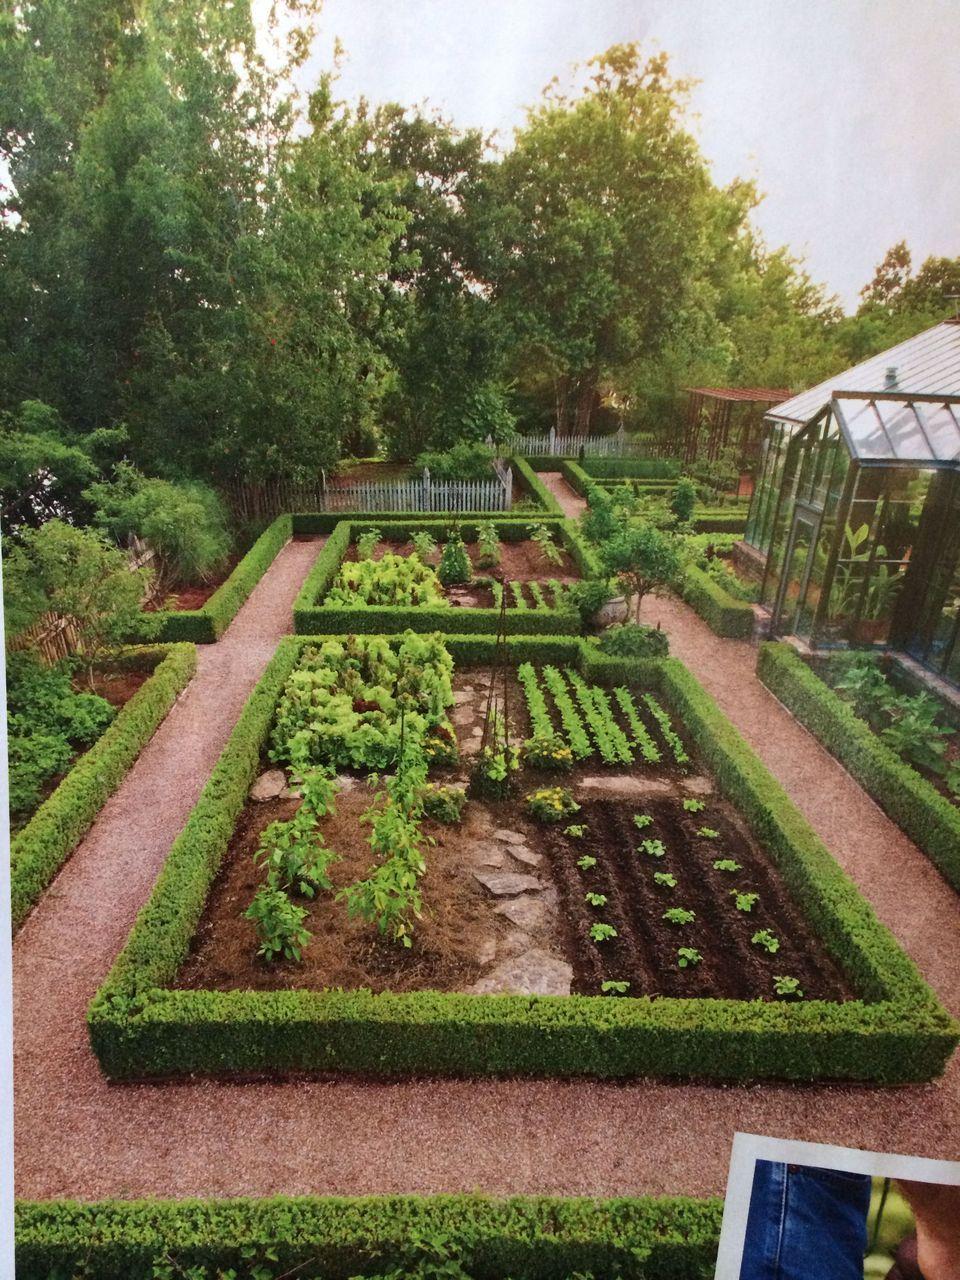 Home vegetable garden design  Homestead farm garden layout and design for your home   Pinterest